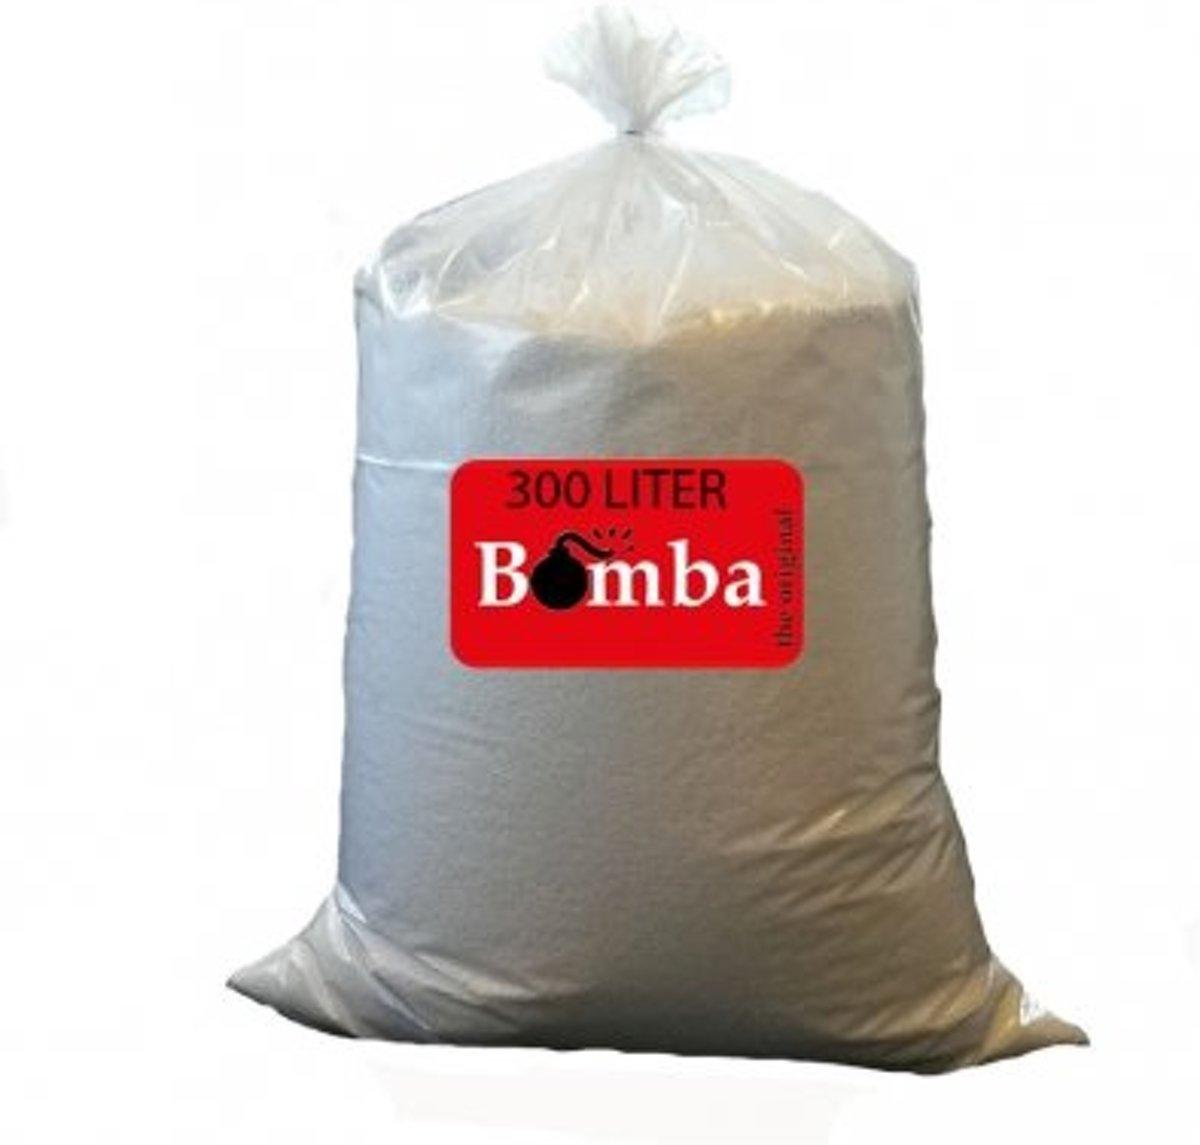 Bomba EPS zitzak vulling zitzakvulling 300 ltr. kopen